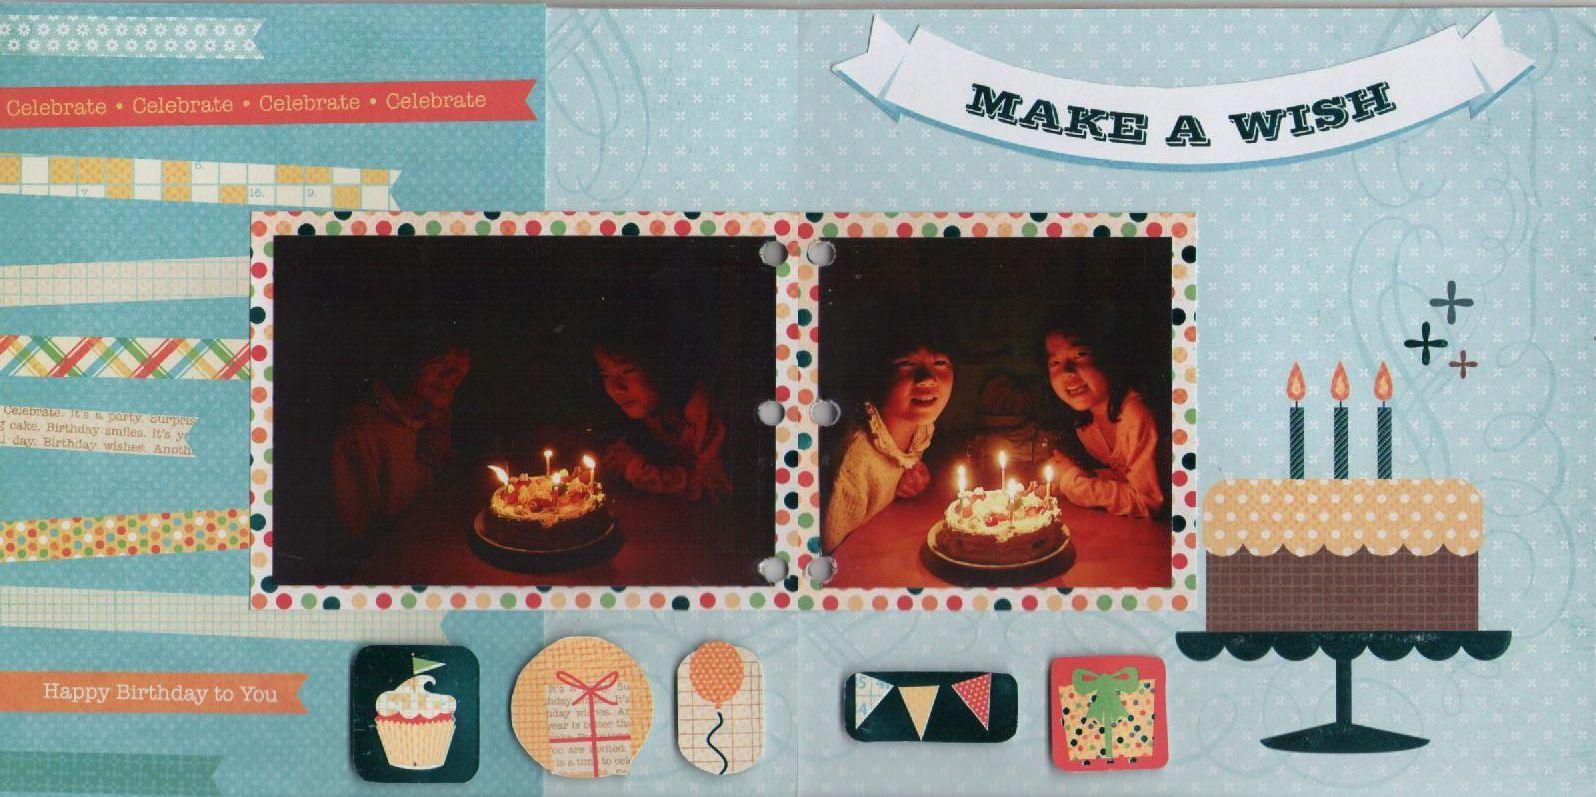 Celebrate6